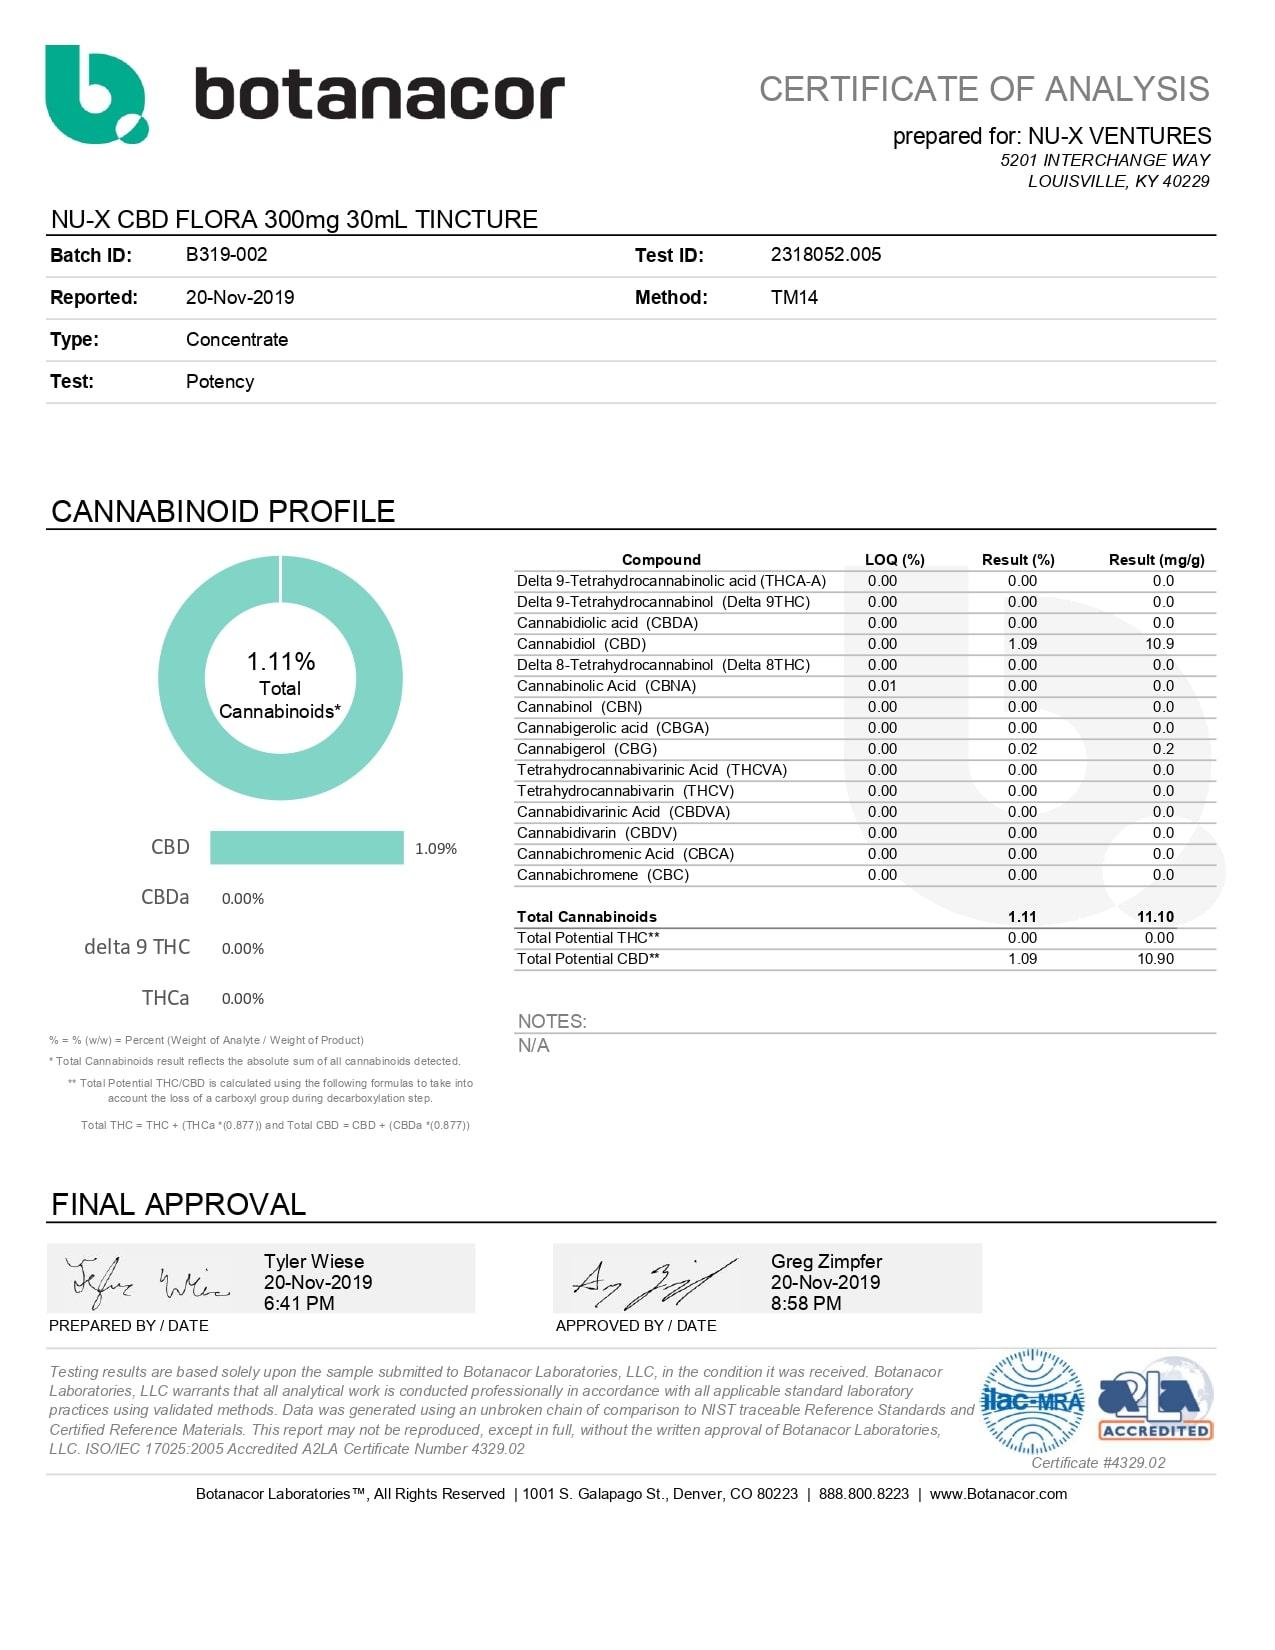 NU-X CBD Tincture Lab Report Flora Citrus 300mg